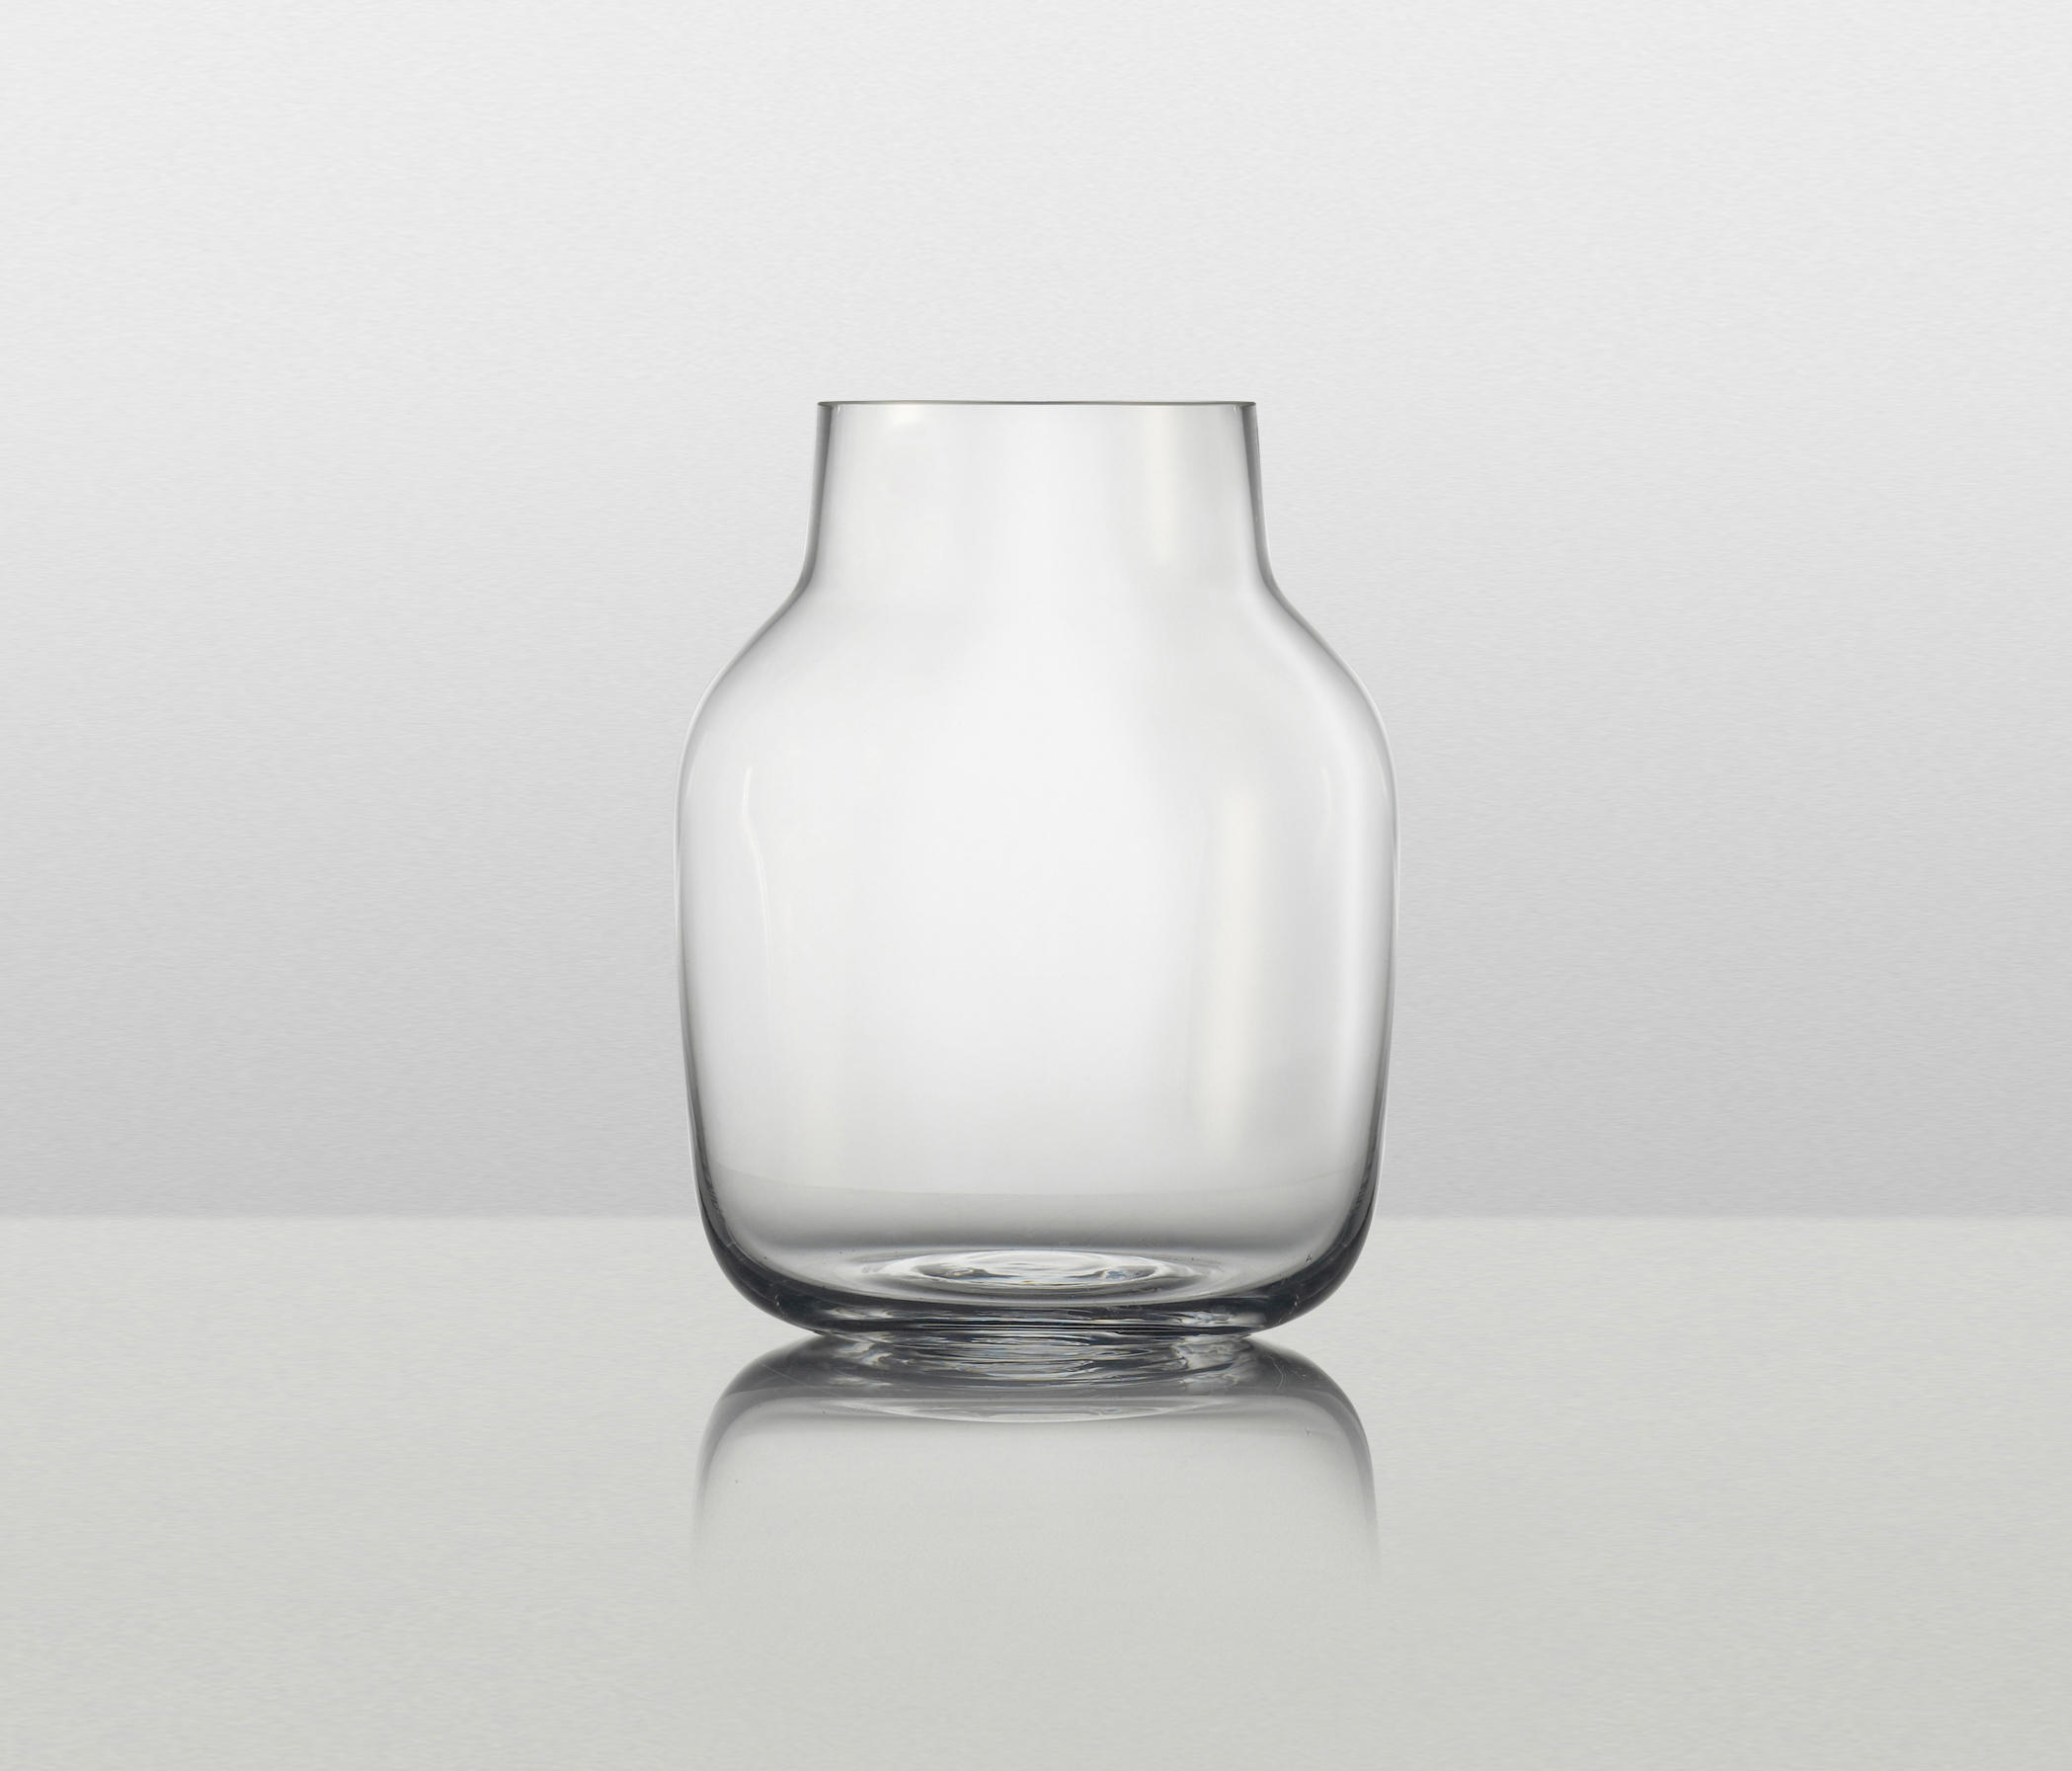 Silent vase large vases from muuto architonic silent vase large by muuto vases reviewsmspy